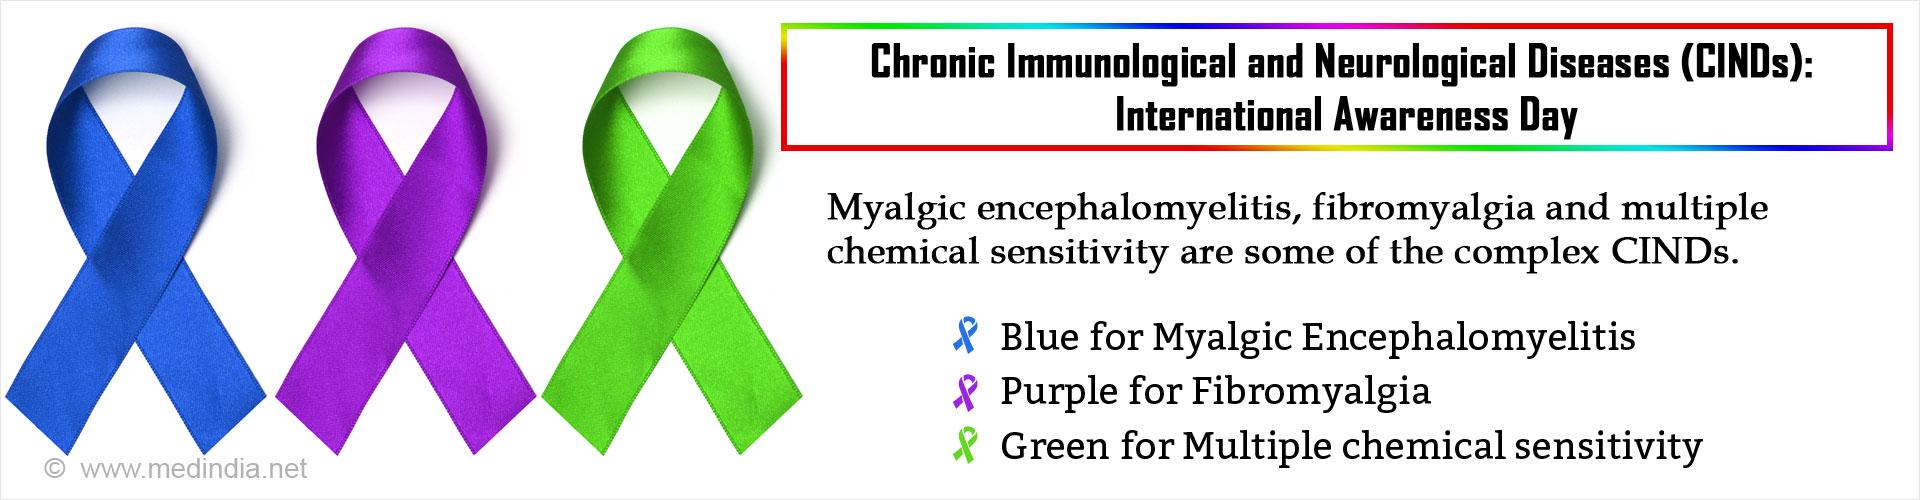 Chronic immunological and neurological diseases (CINDs) International Day Myalgic encephalomyelitis, fibro myalgia and mutltiple chemical sensitivity are some of the complex CINDs Blue for Myalgic Encephalomyelitis Purple for Fibromyalgia  Green for Multiple chemical sensitivity